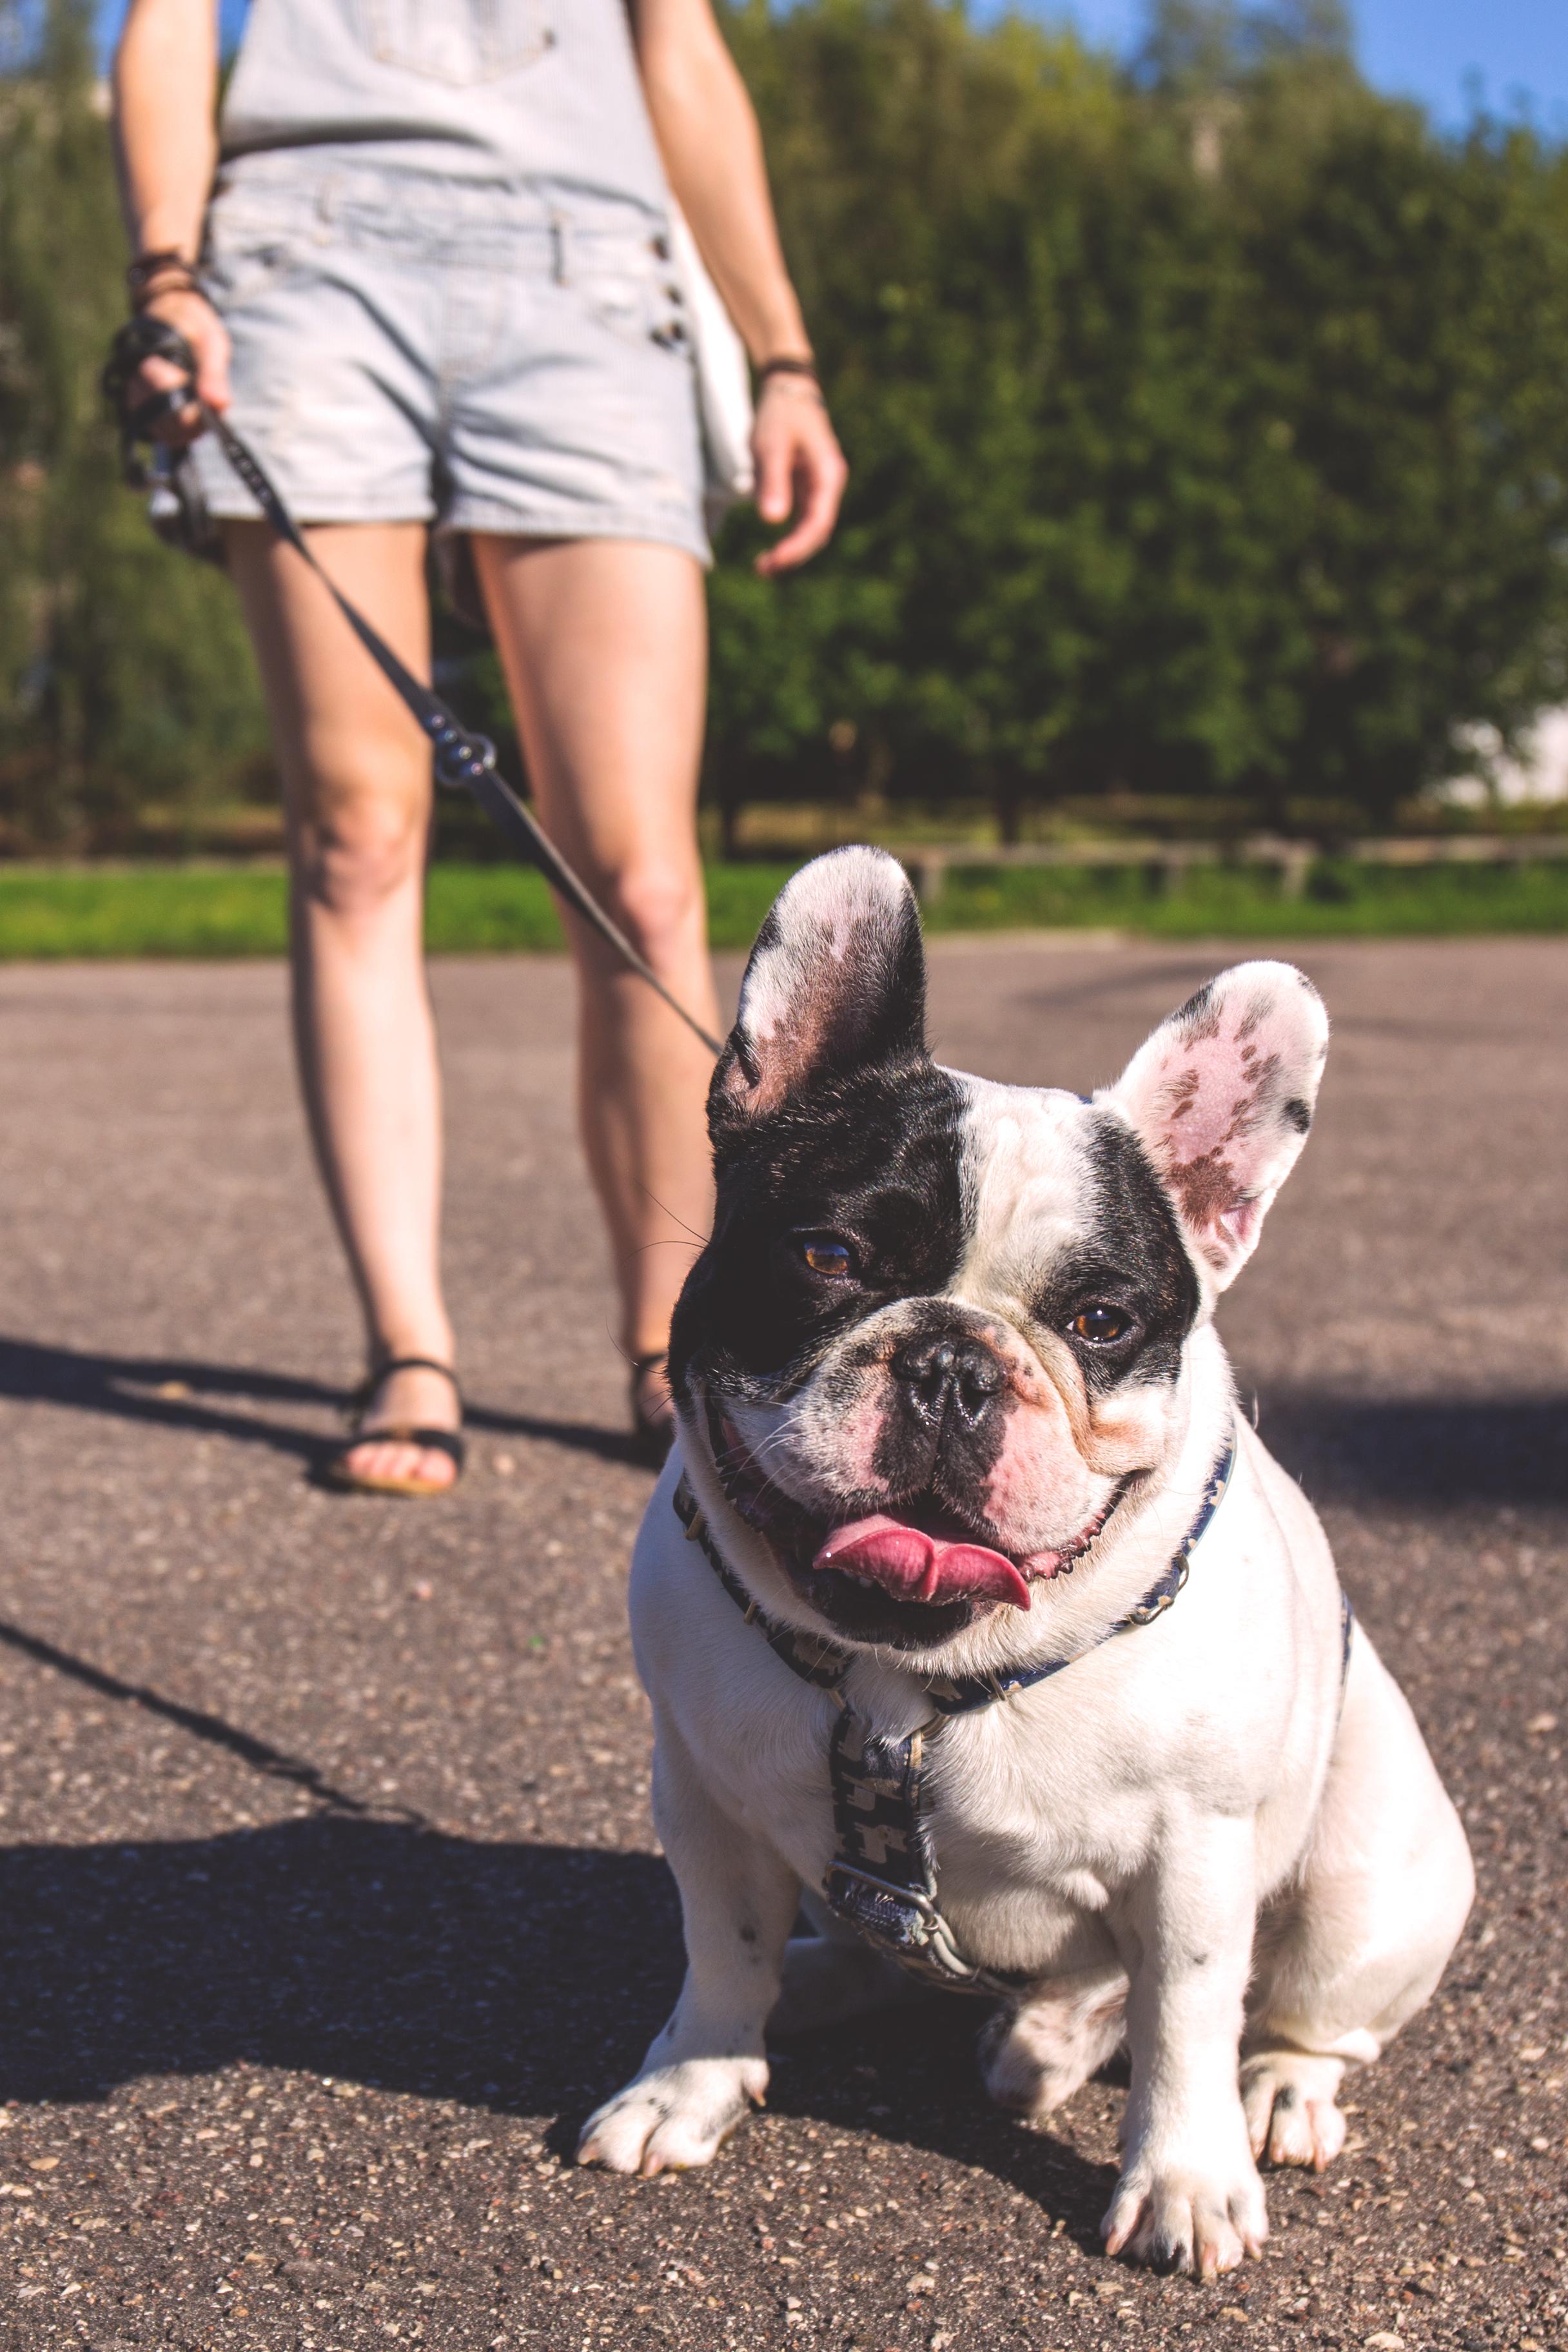 Best Bulldog Canine Adorable Dog - puppy-dog-animal-cute-canine-pet-mammal-bulldog-vertebrate-adorable-french-bulldog-old-english-bulldog-dog-like-mammal-olde-english-bulldogge-1087191  Photograph_797581  .jpg